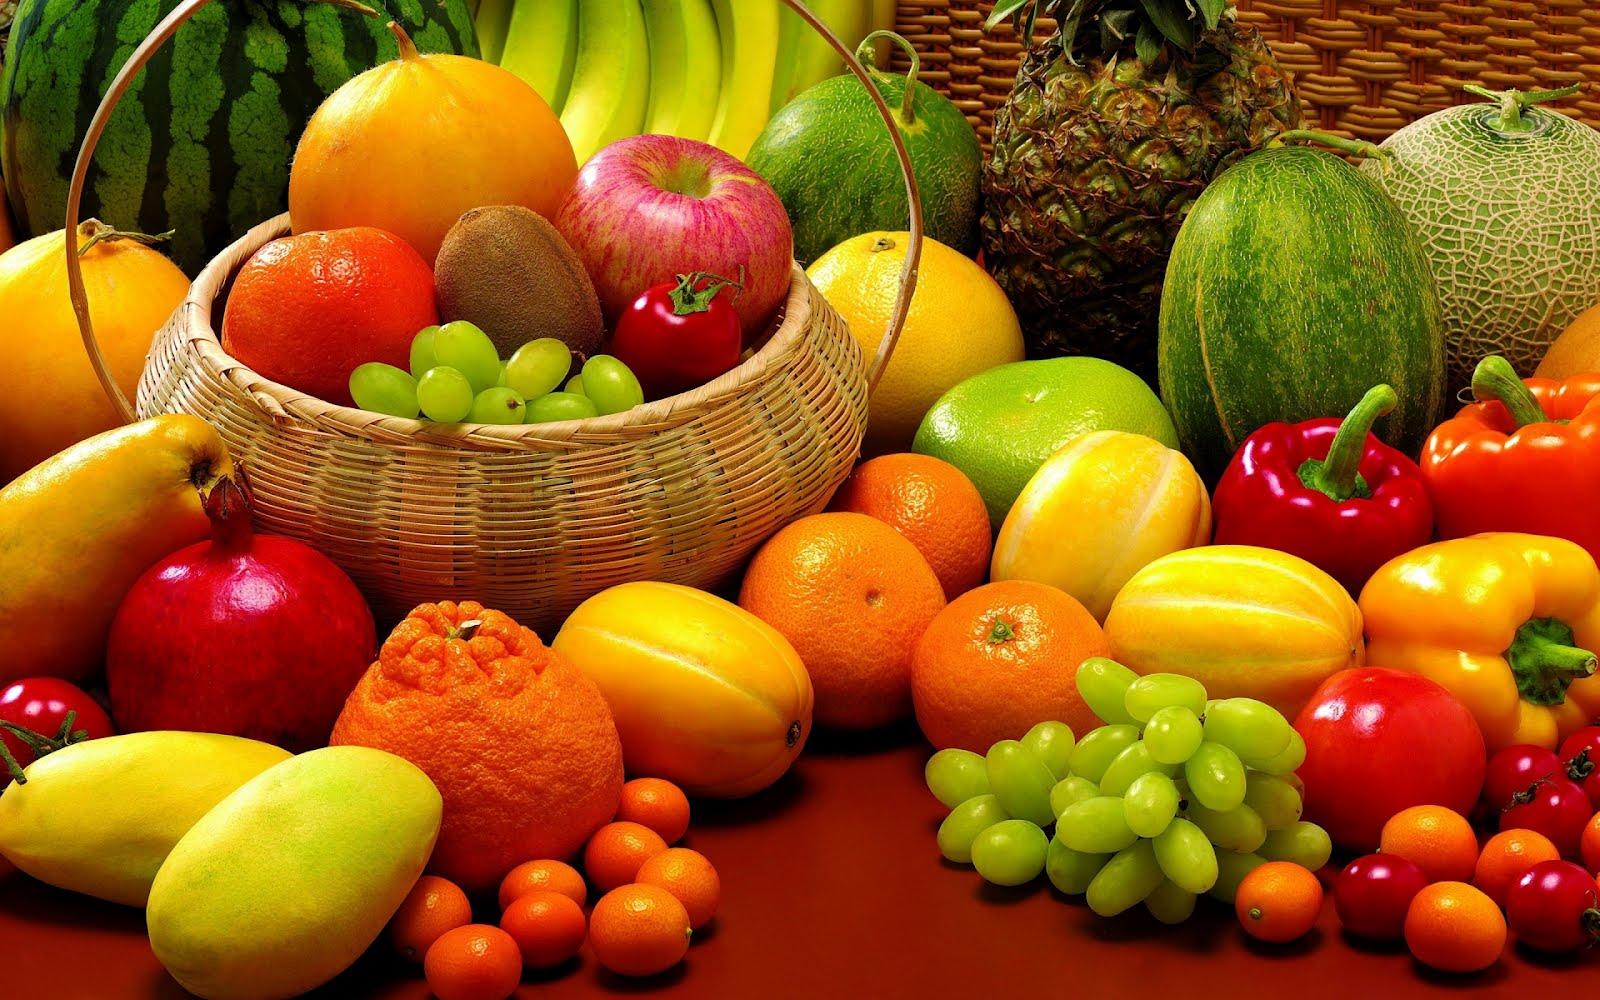 fotos.galeria_2009.Frutas-varias.jpg